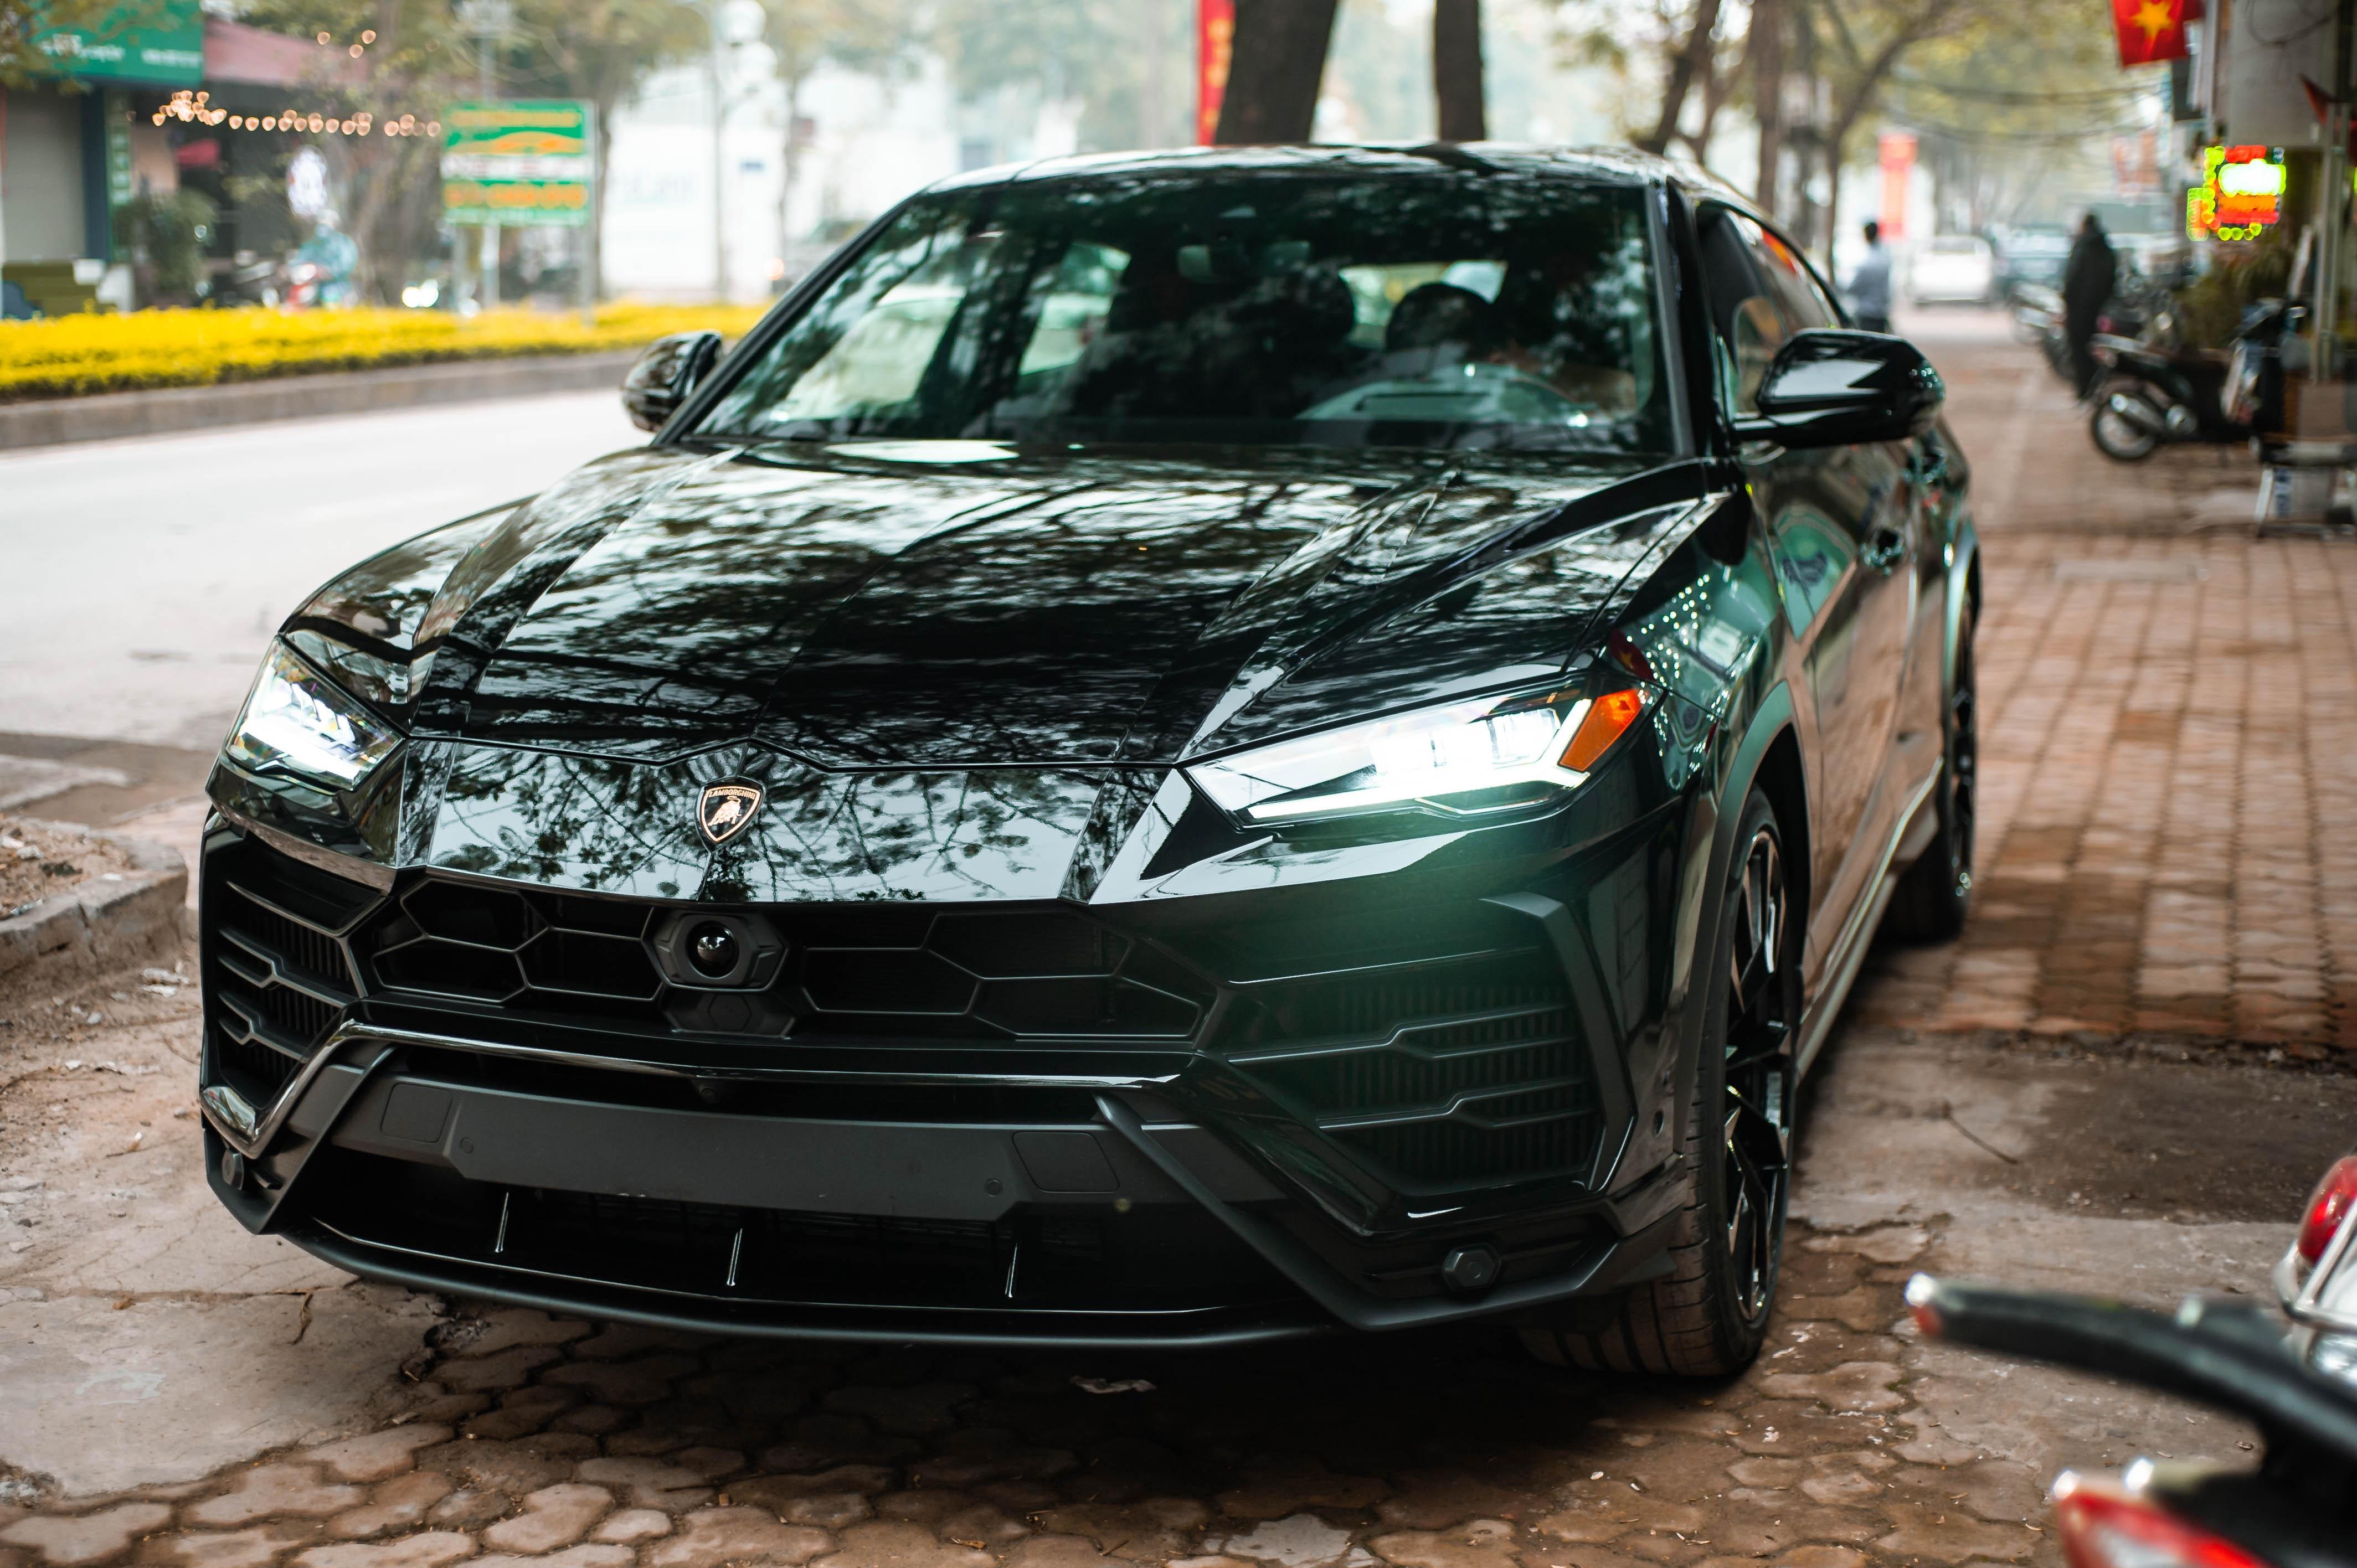 Ngam Lamborghini Urus mau den dau tien ve VN, gia khoang 1 trieu USD hinh anh 48 BAC_7991_1.jpg